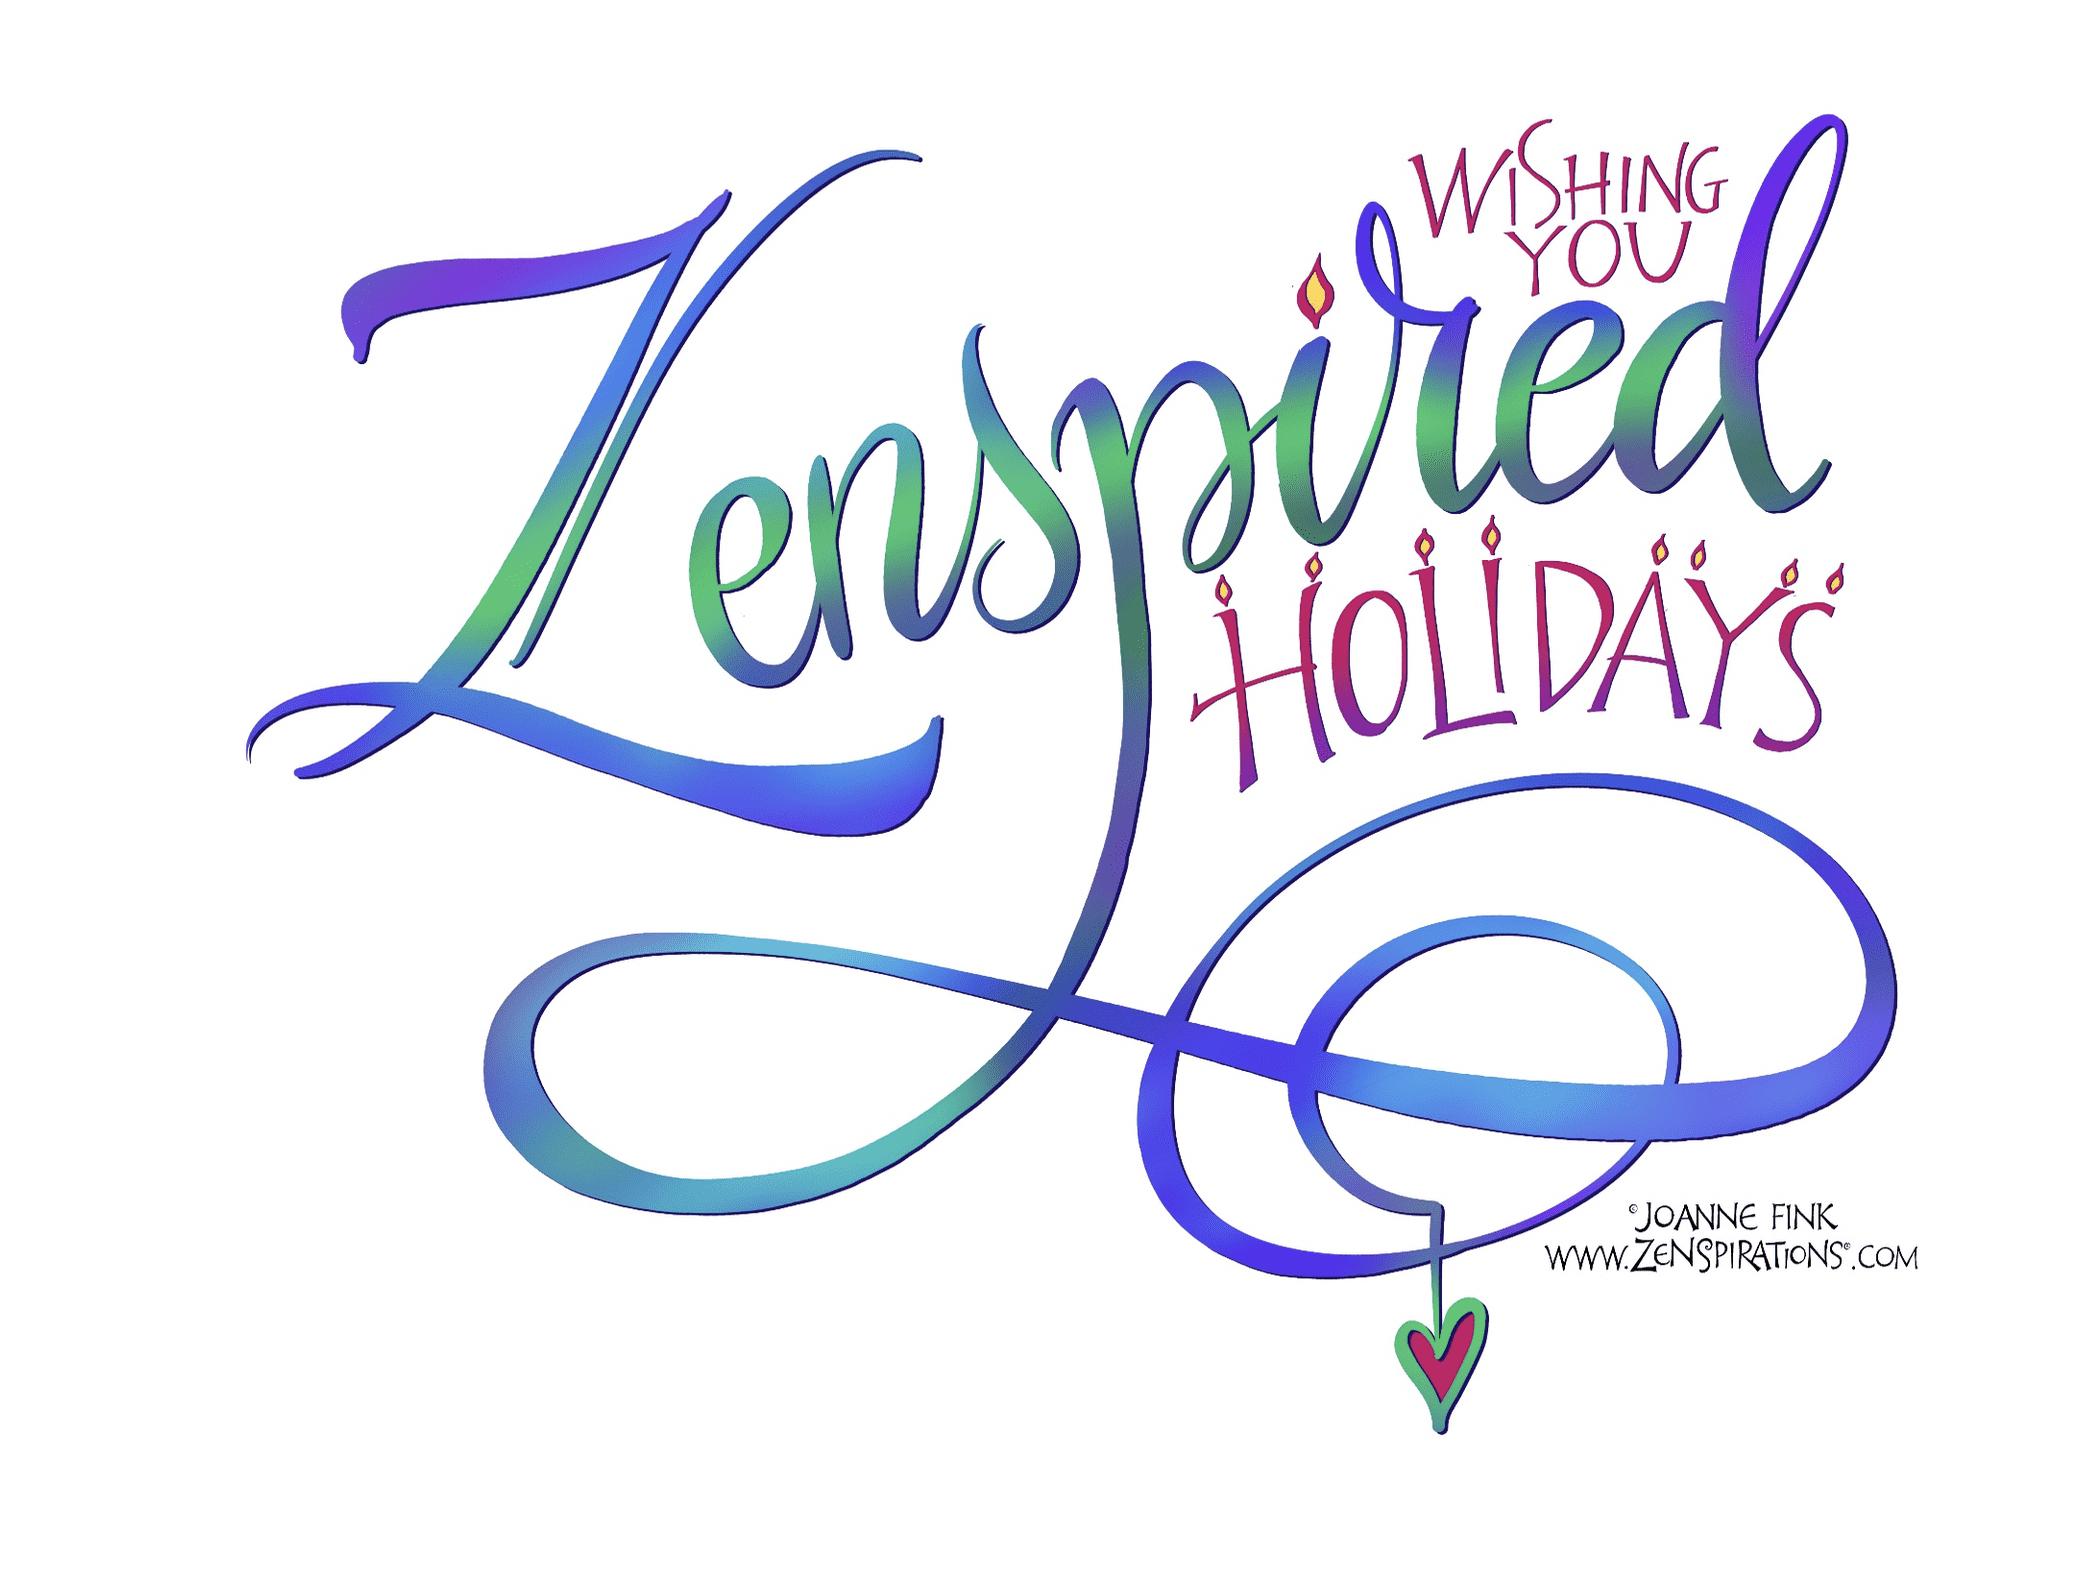 zenspirations_by_joanne_fink_blog_12_26_2016_zenspired_holidays